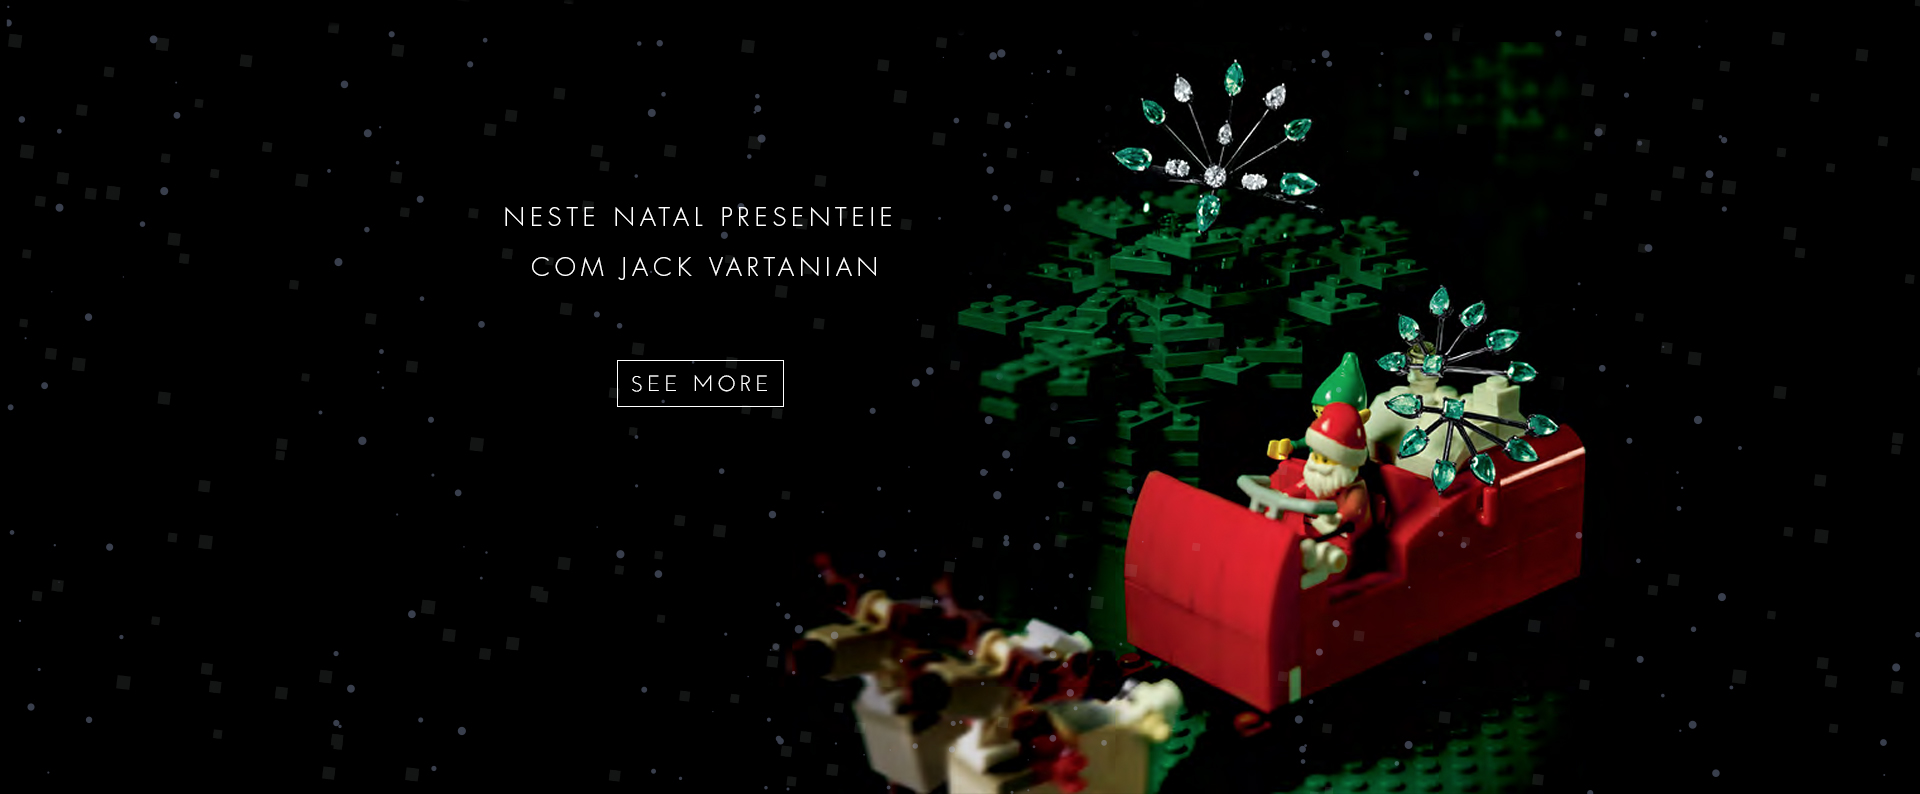 Presenteie com Jack Vartanian